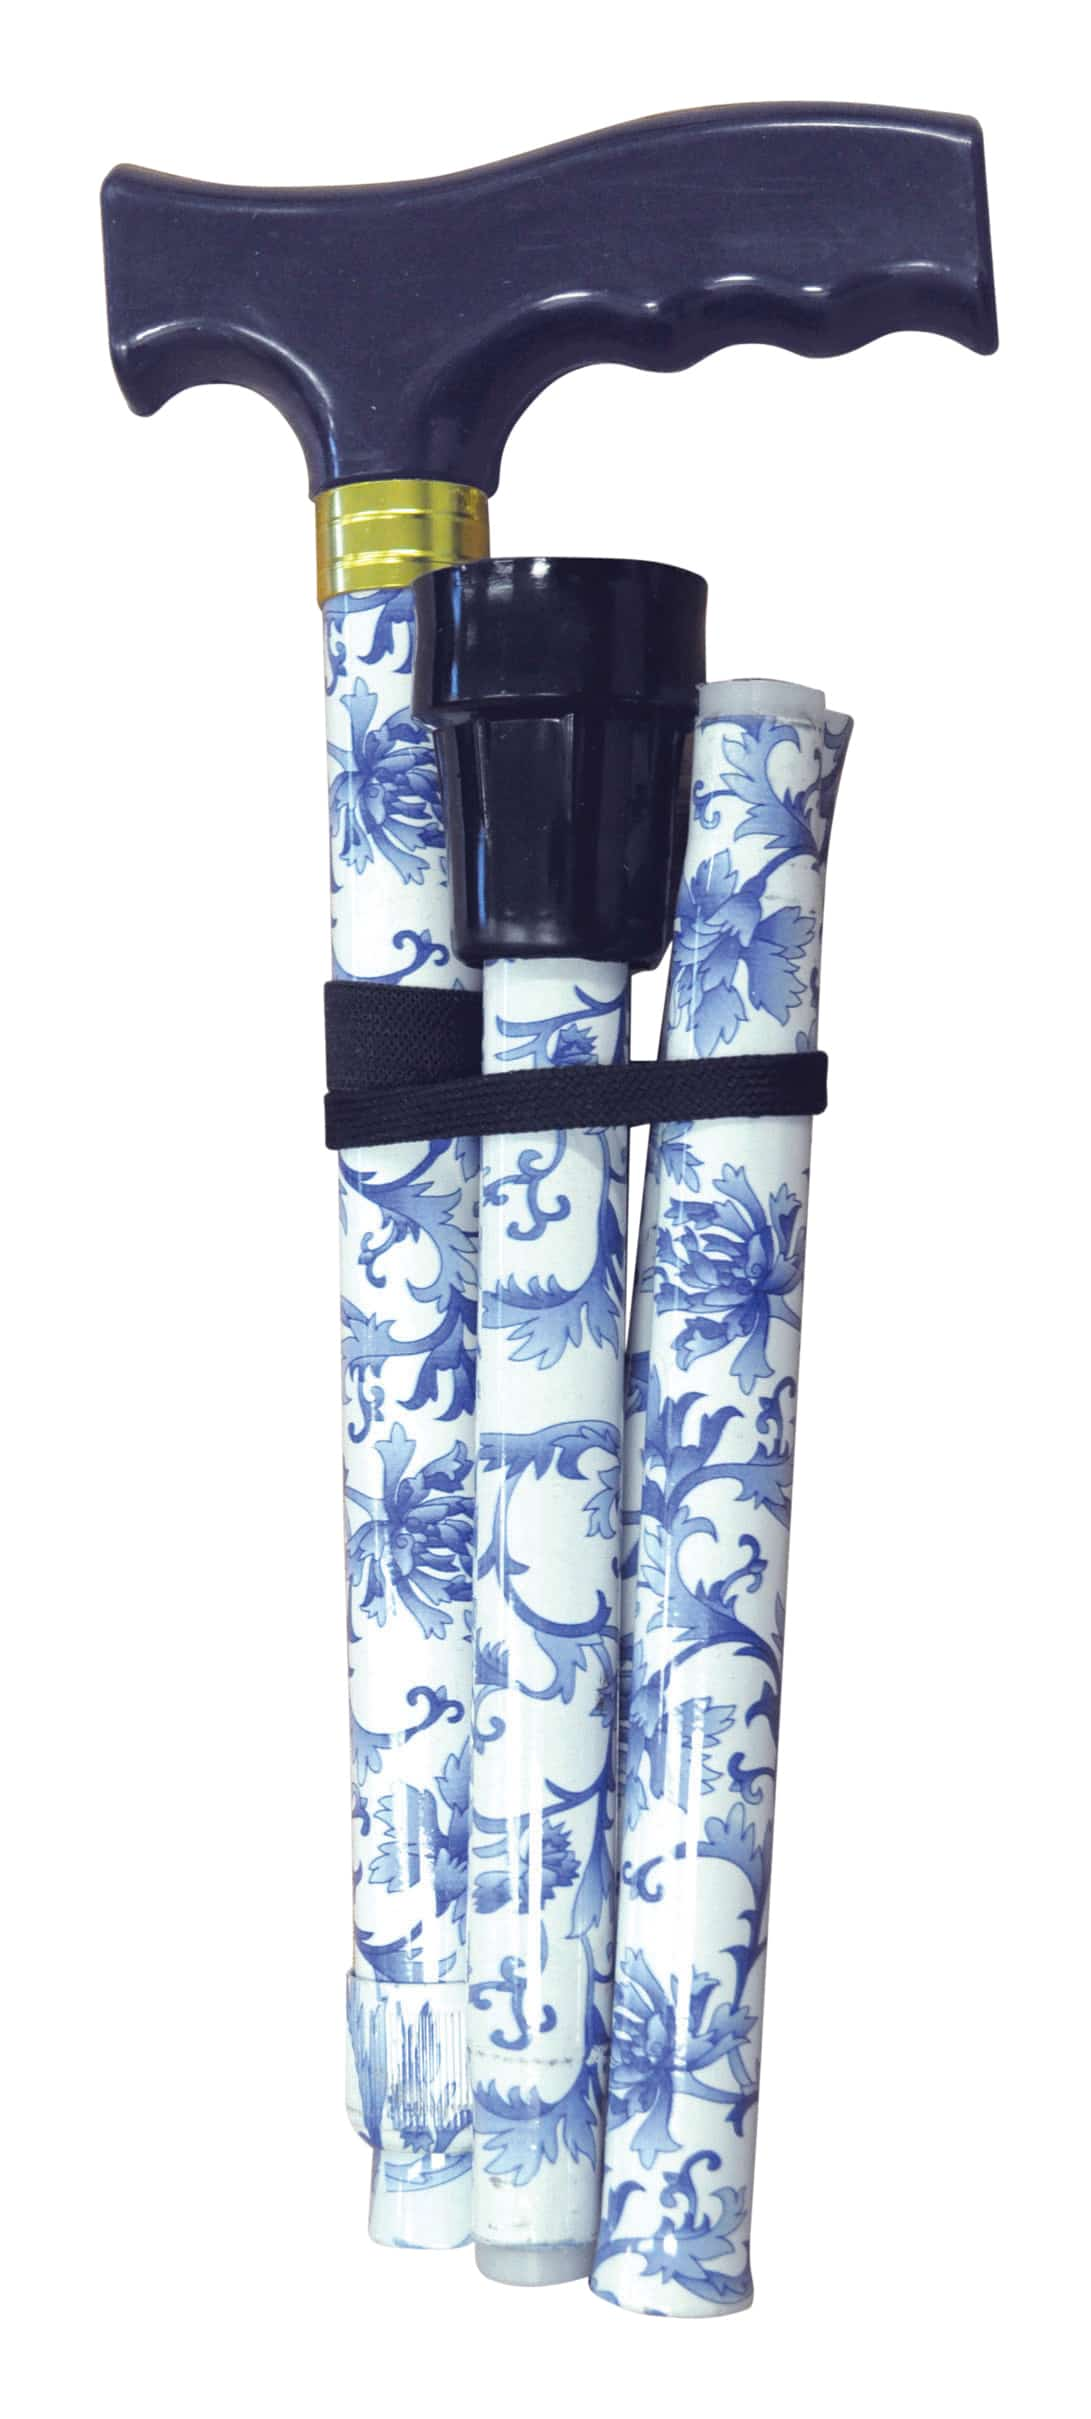 Folding Extendable Plastic Handled Walking Stick - Blue/White Floral Design